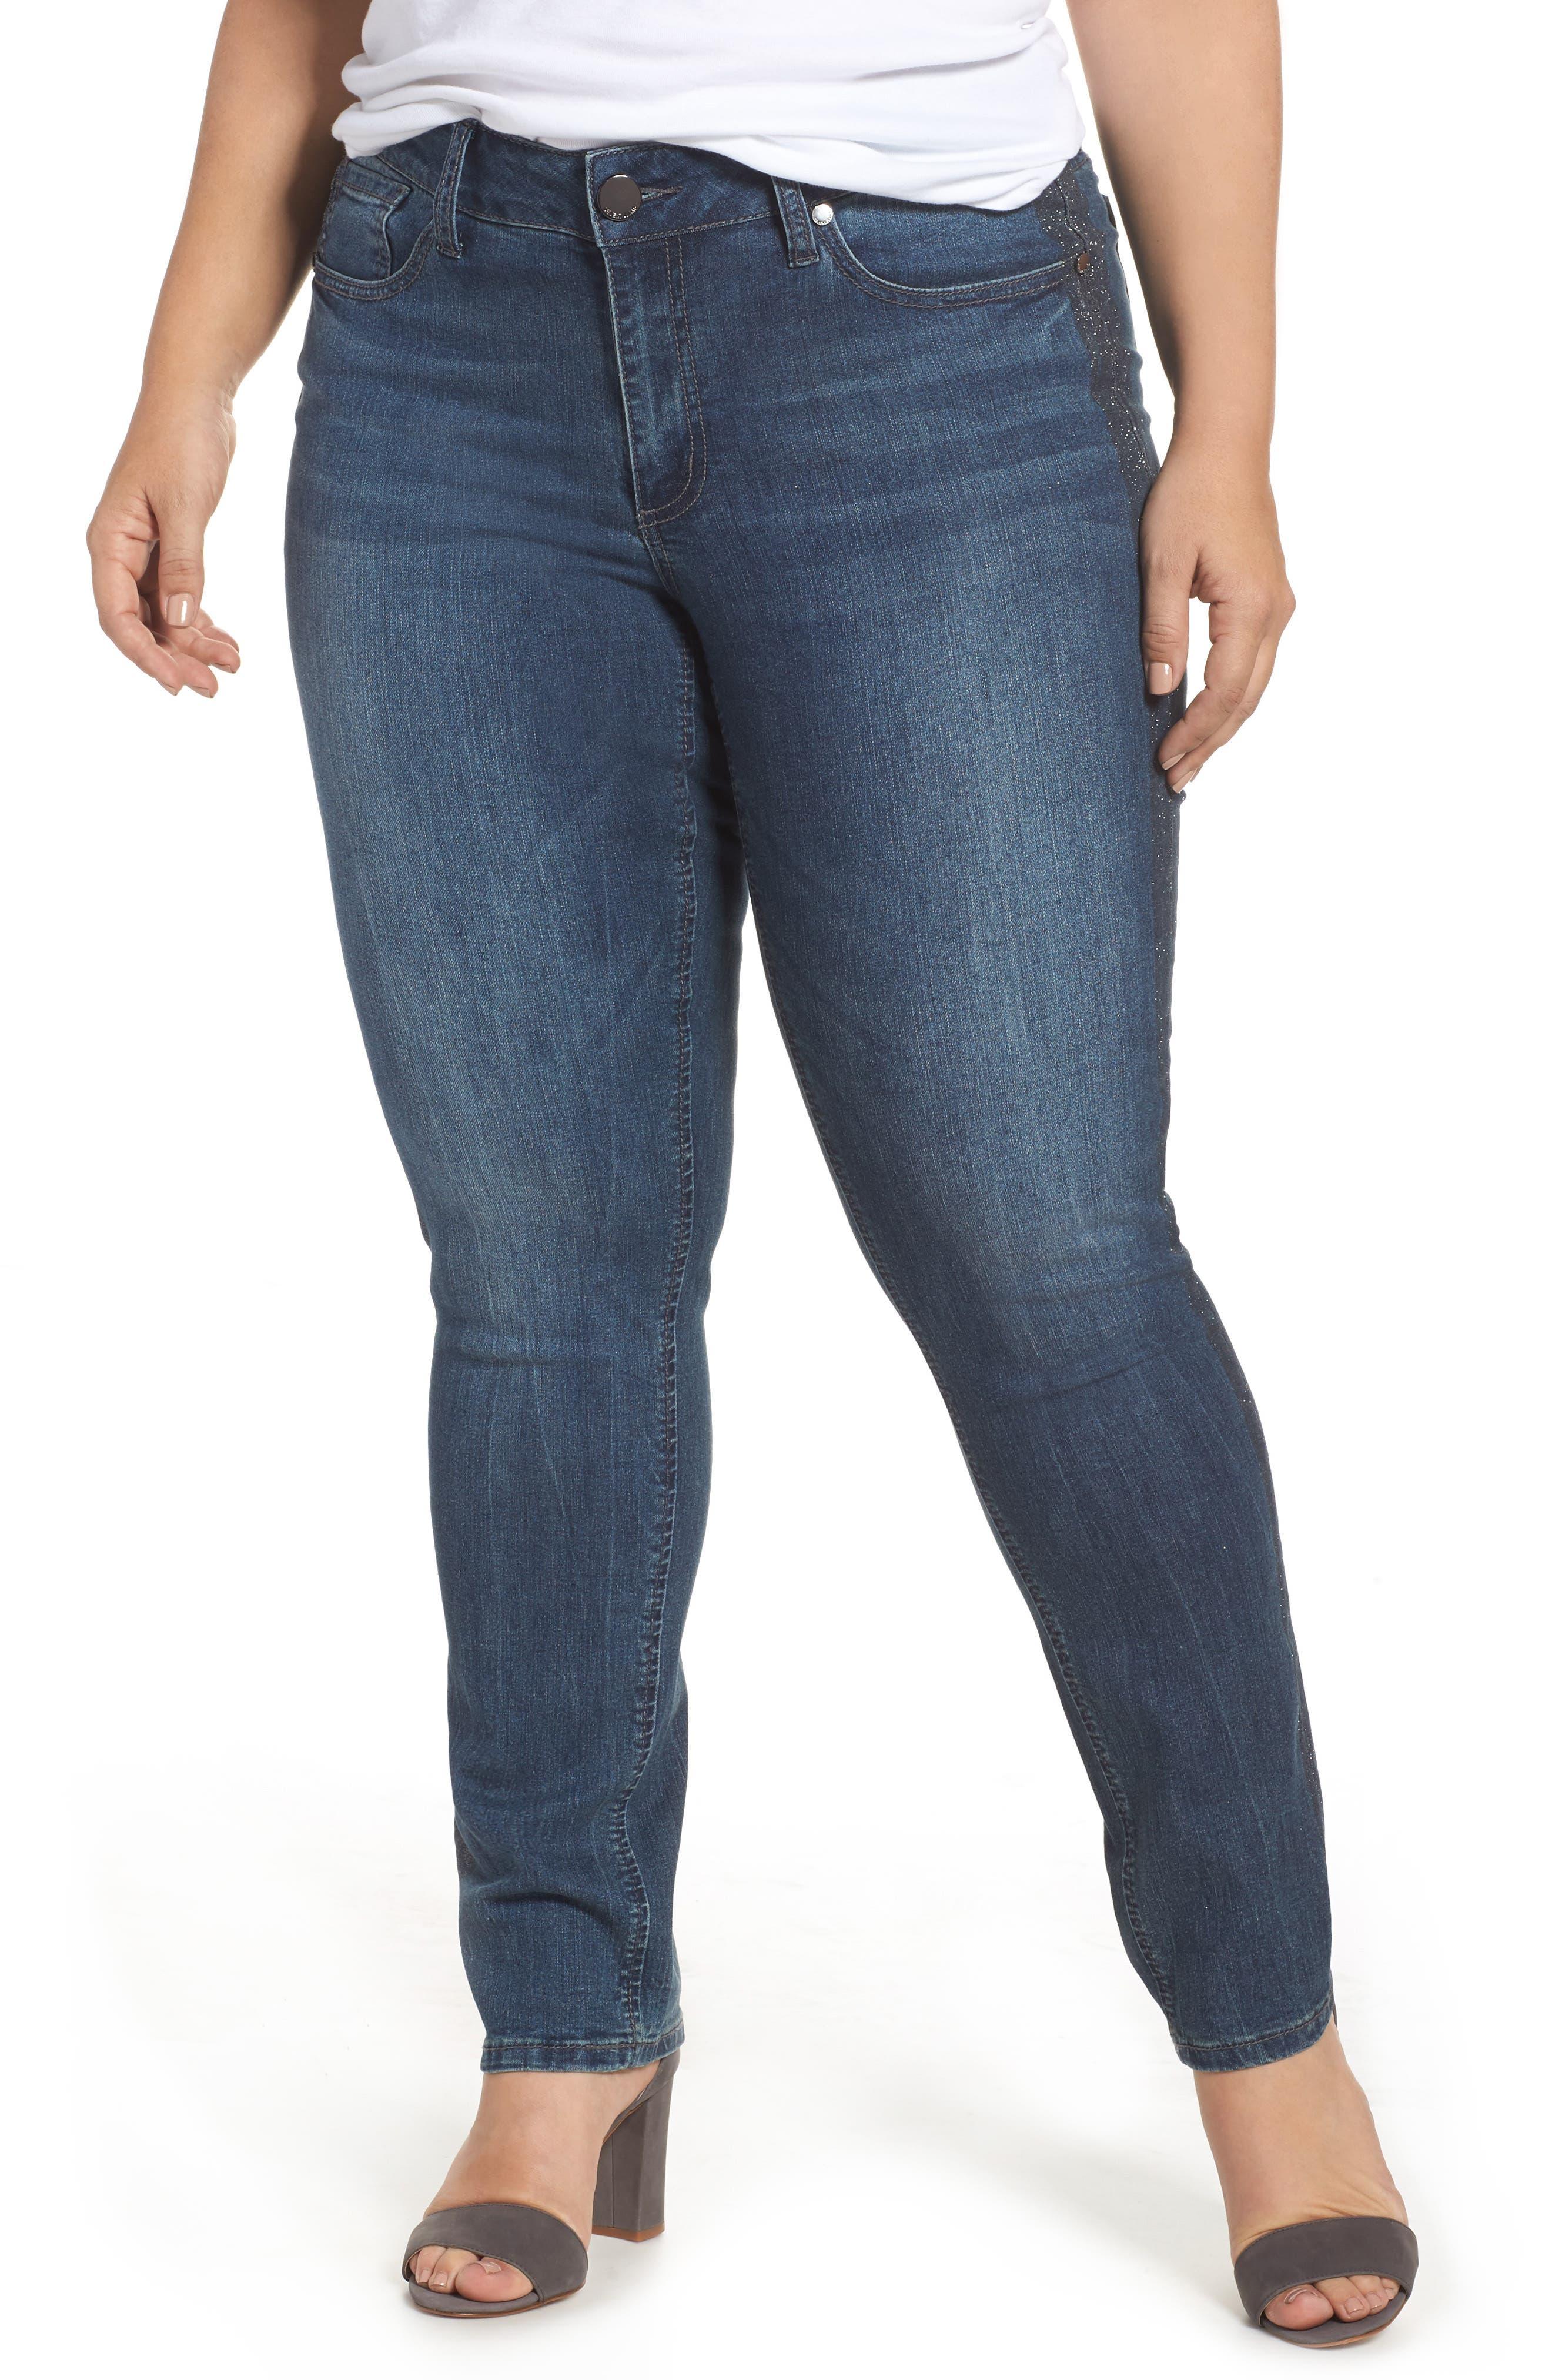 Main Image - Seven7 Printed Foil Tuxedo Stripe Skinny Jeans (Locke) (Plus Size)